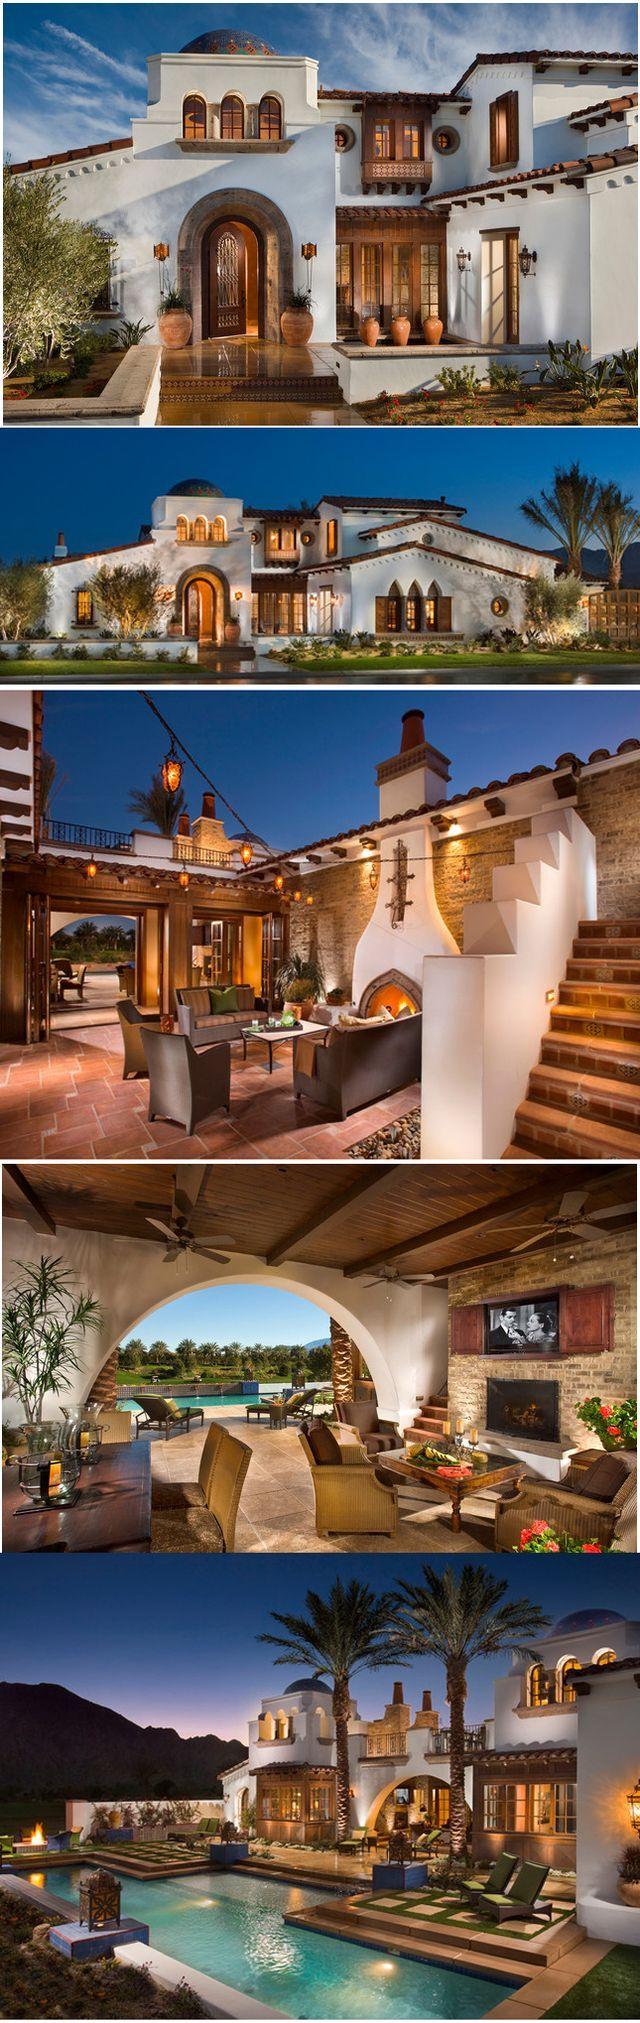 Amazeballs getaway and home!!! Genius open spaced design and lush Spanish/Mediterranean style interior design.